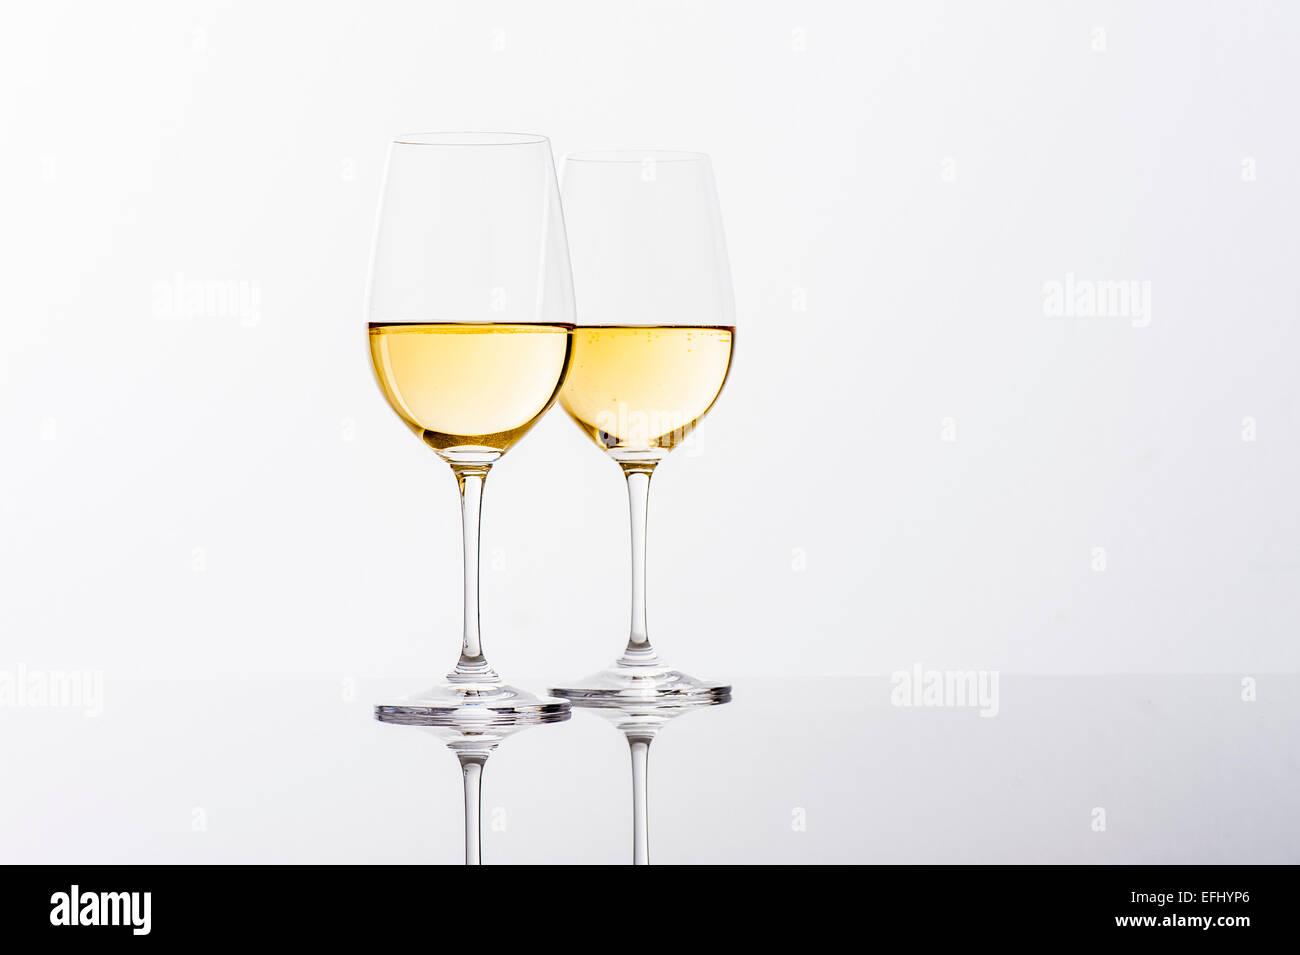 Two glasses of white wine, Hamburg, Northern Germany, Germany - Stock Image